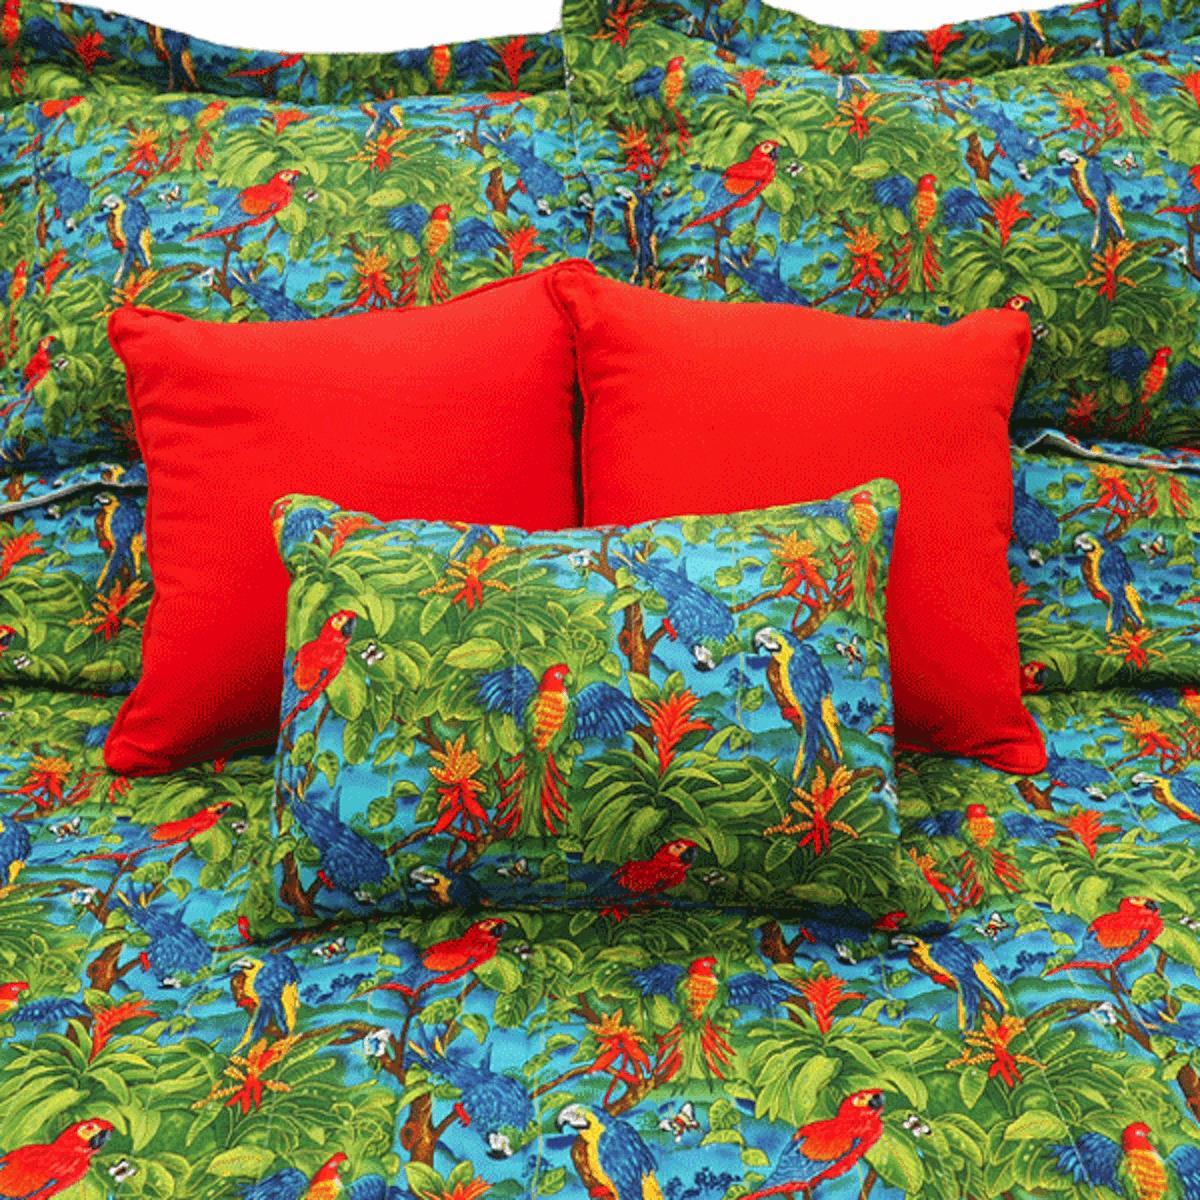 Parrots Bedspread Collection -